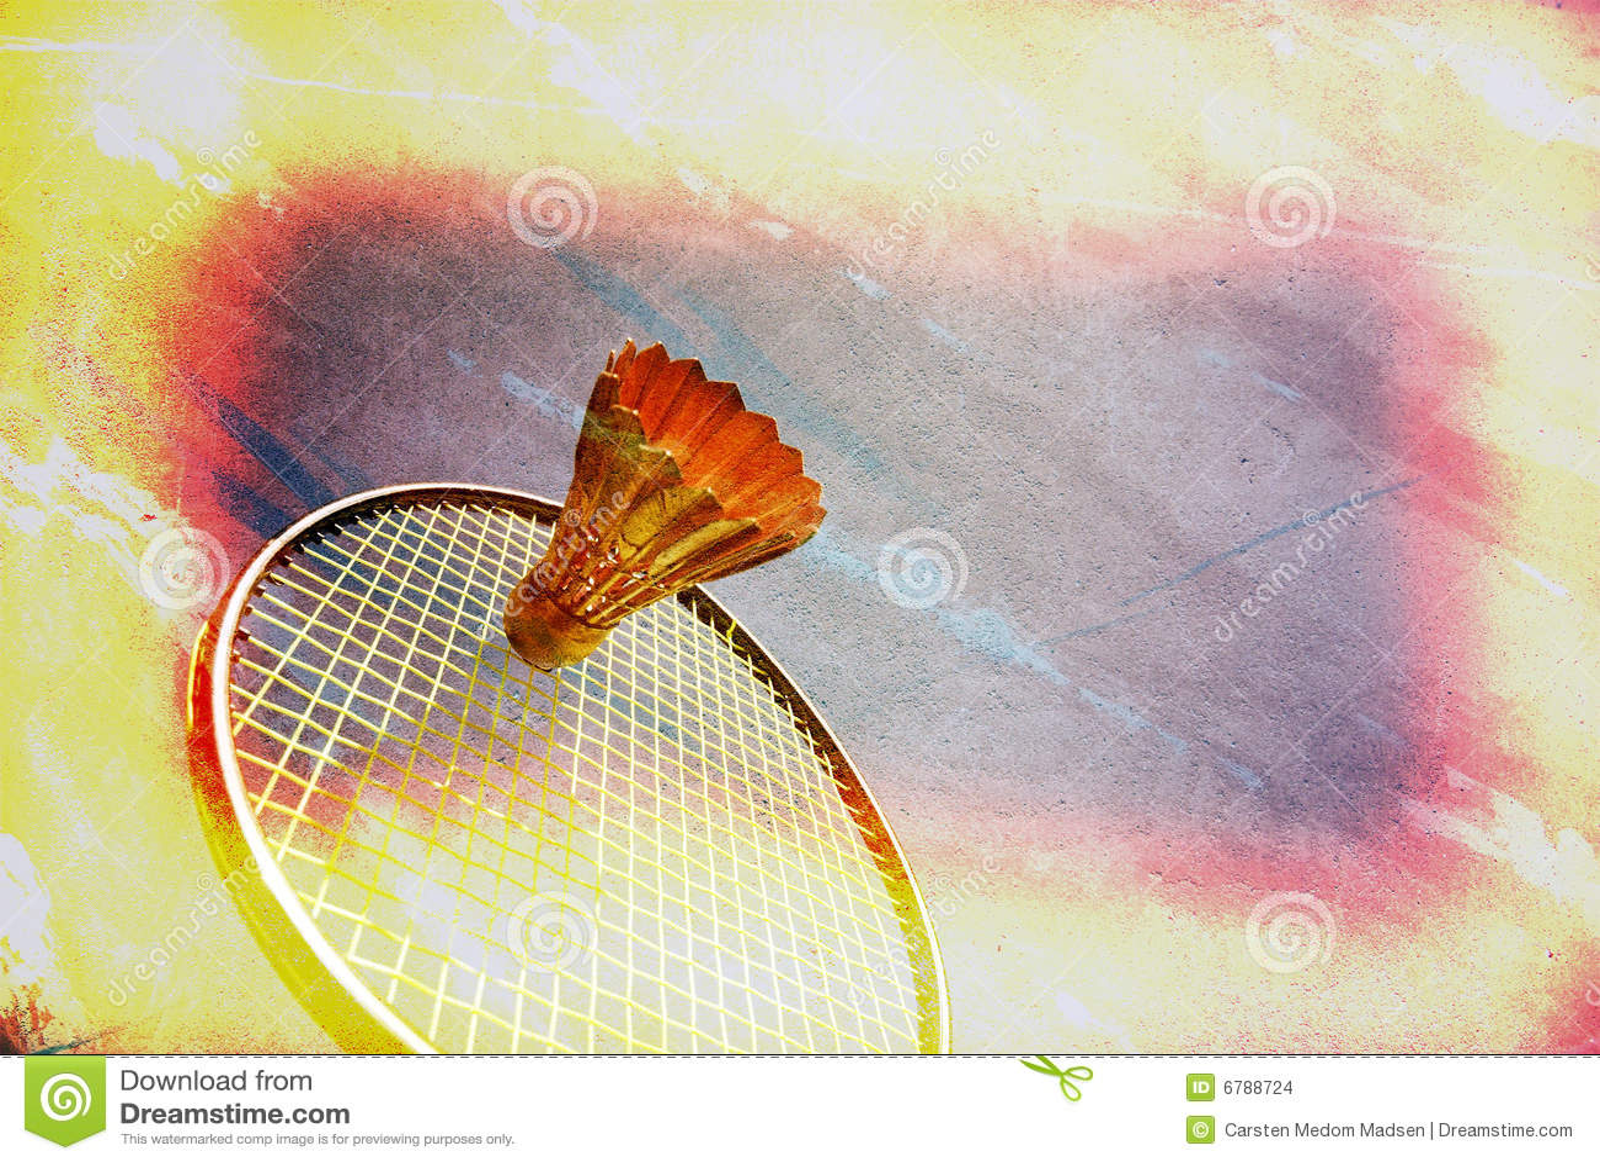 Play Badminton.